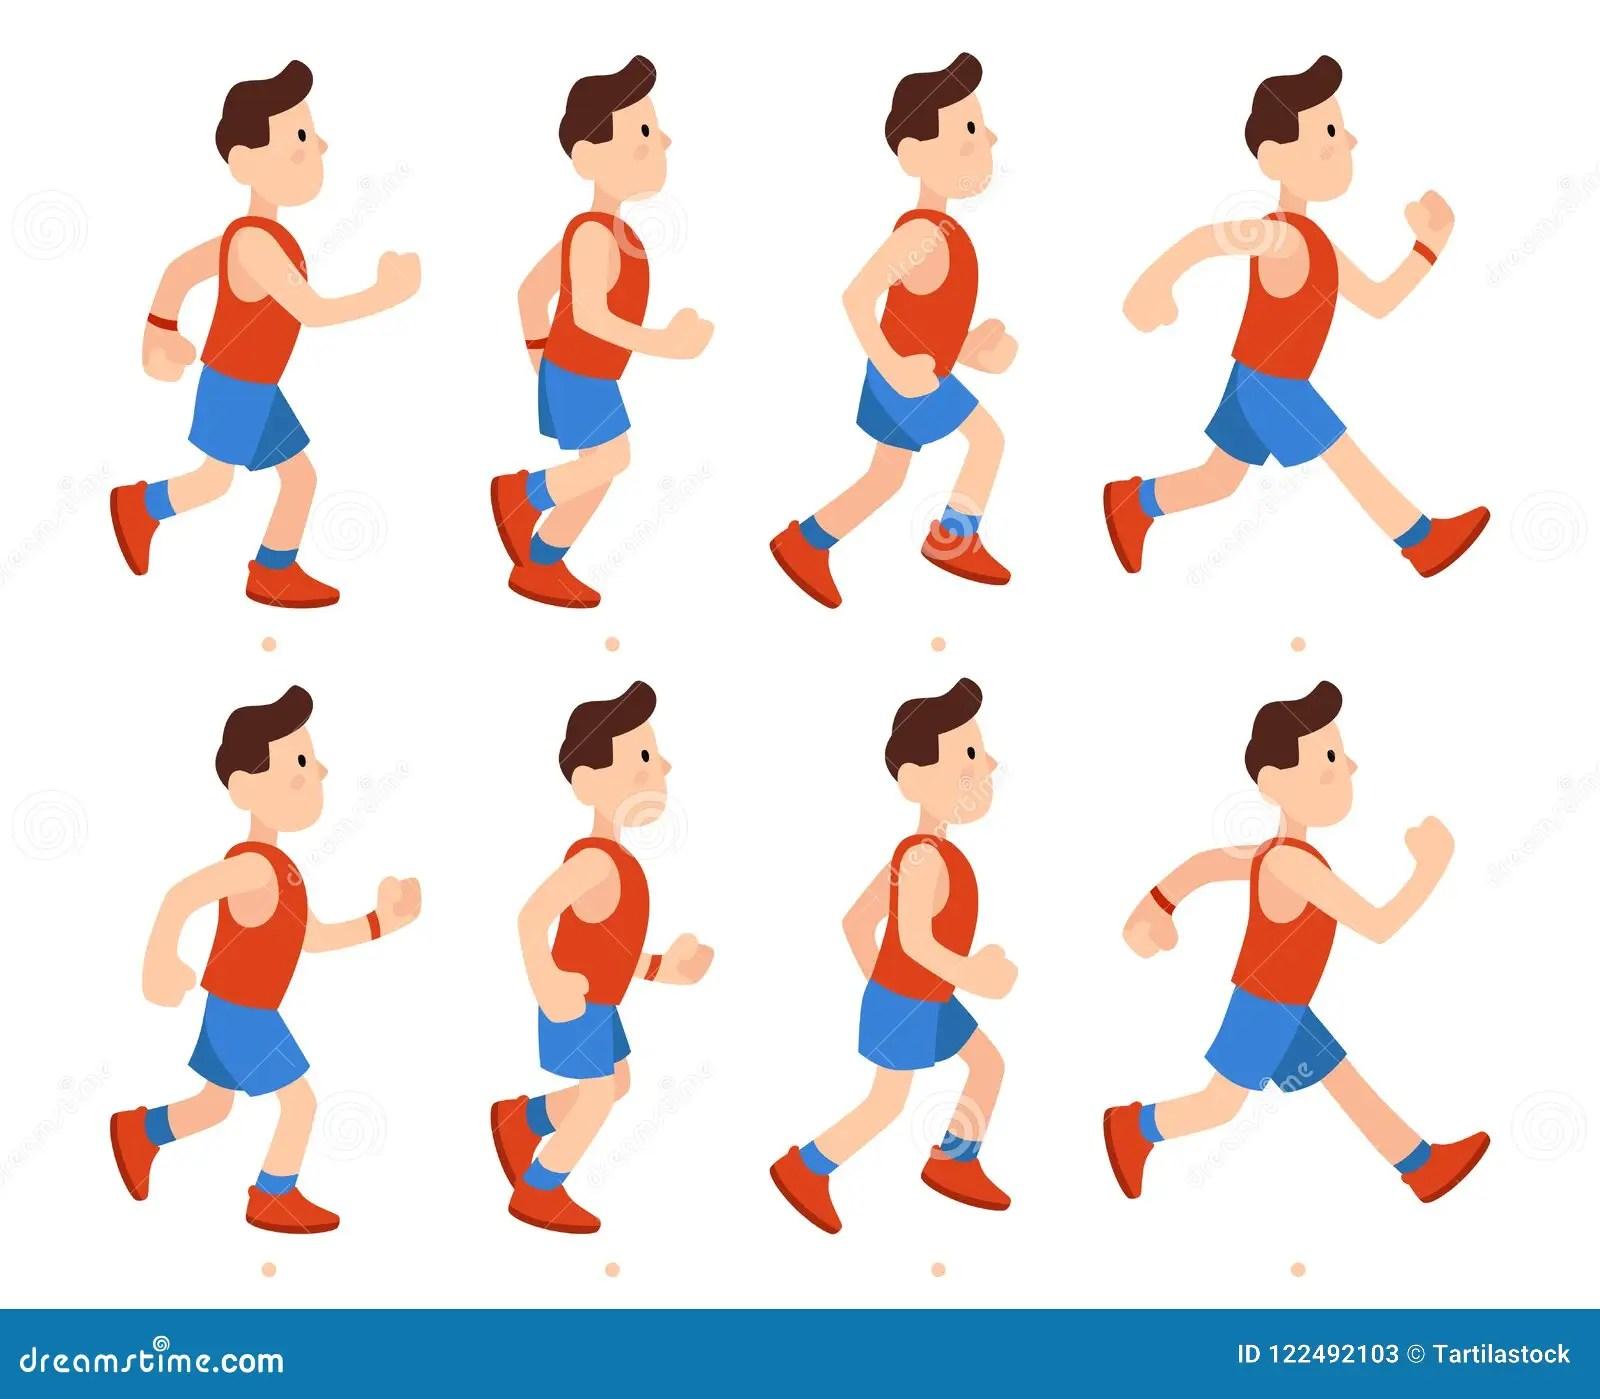 Flat Running Man Athletic Boy Run Animation Frames